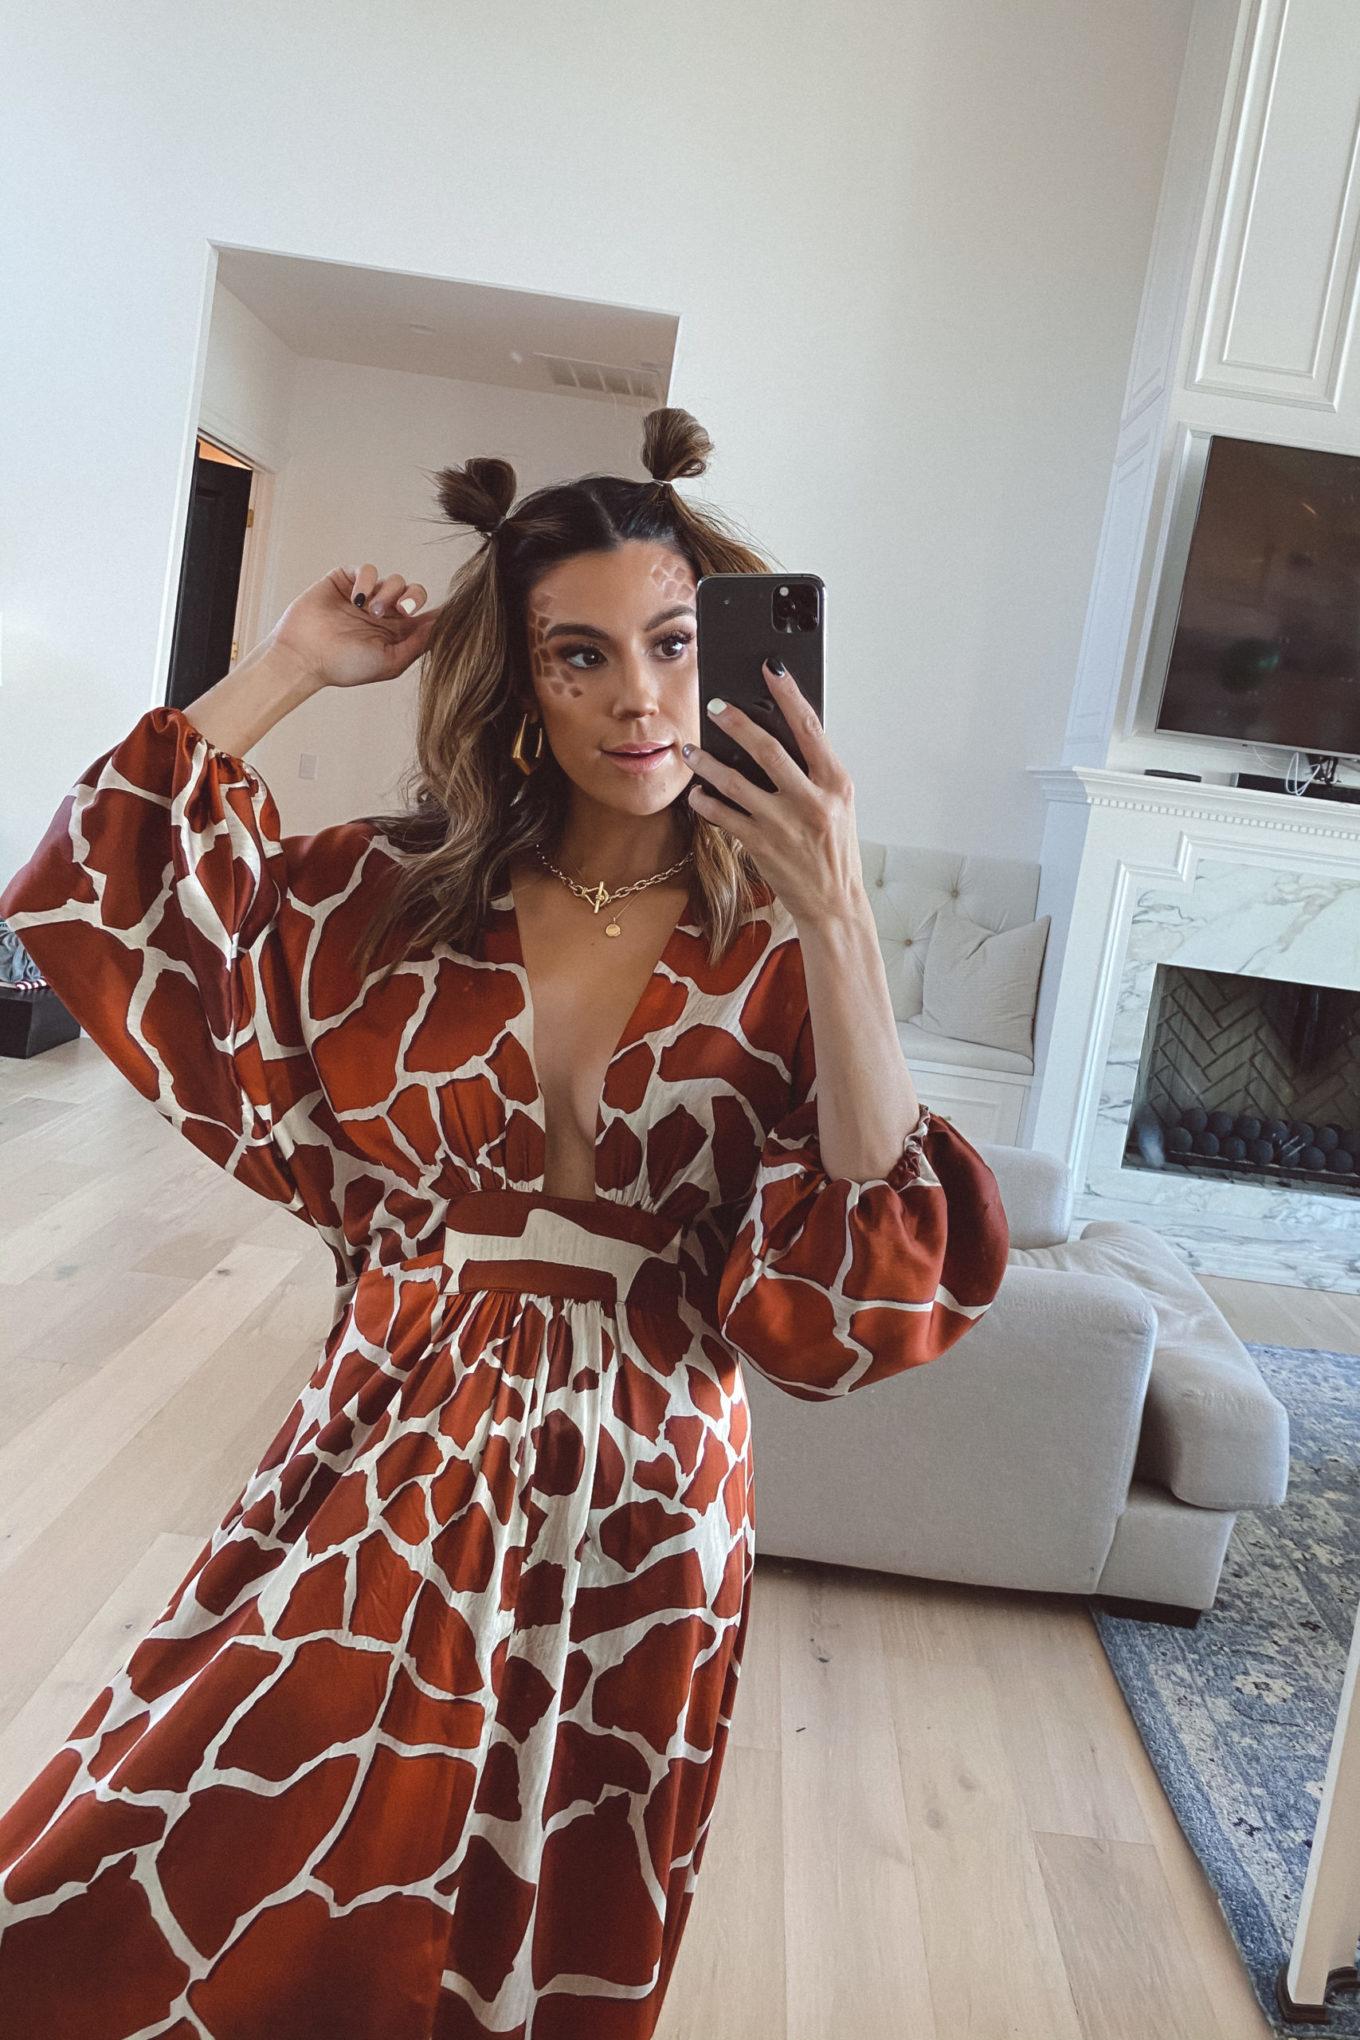 animal prints for halloween costumes